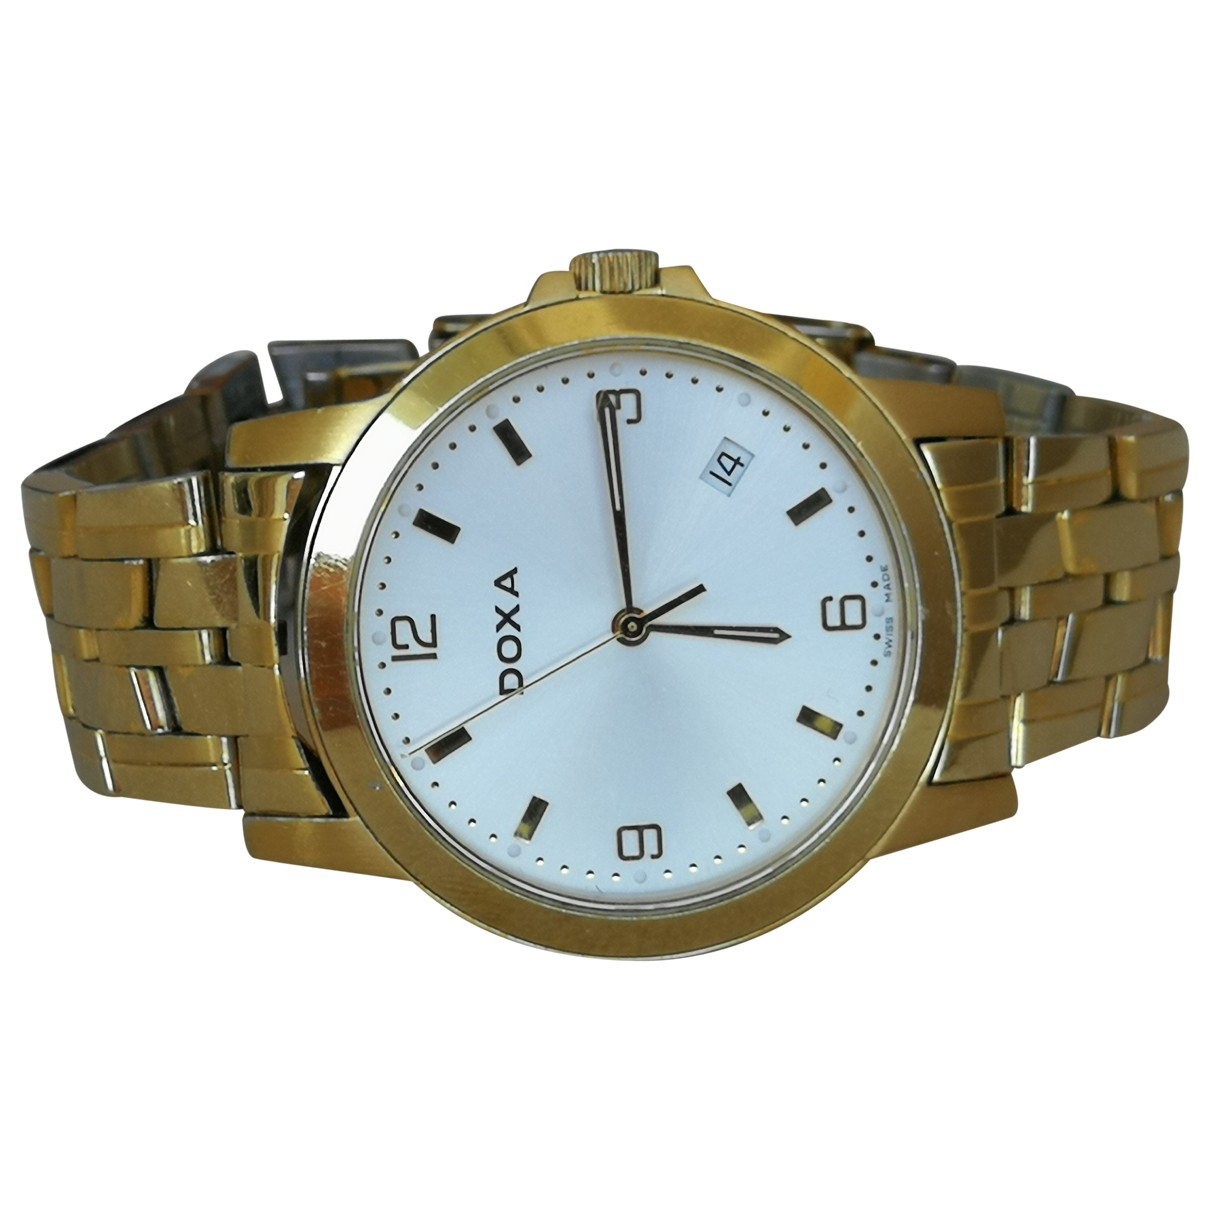 Relojes Doxa